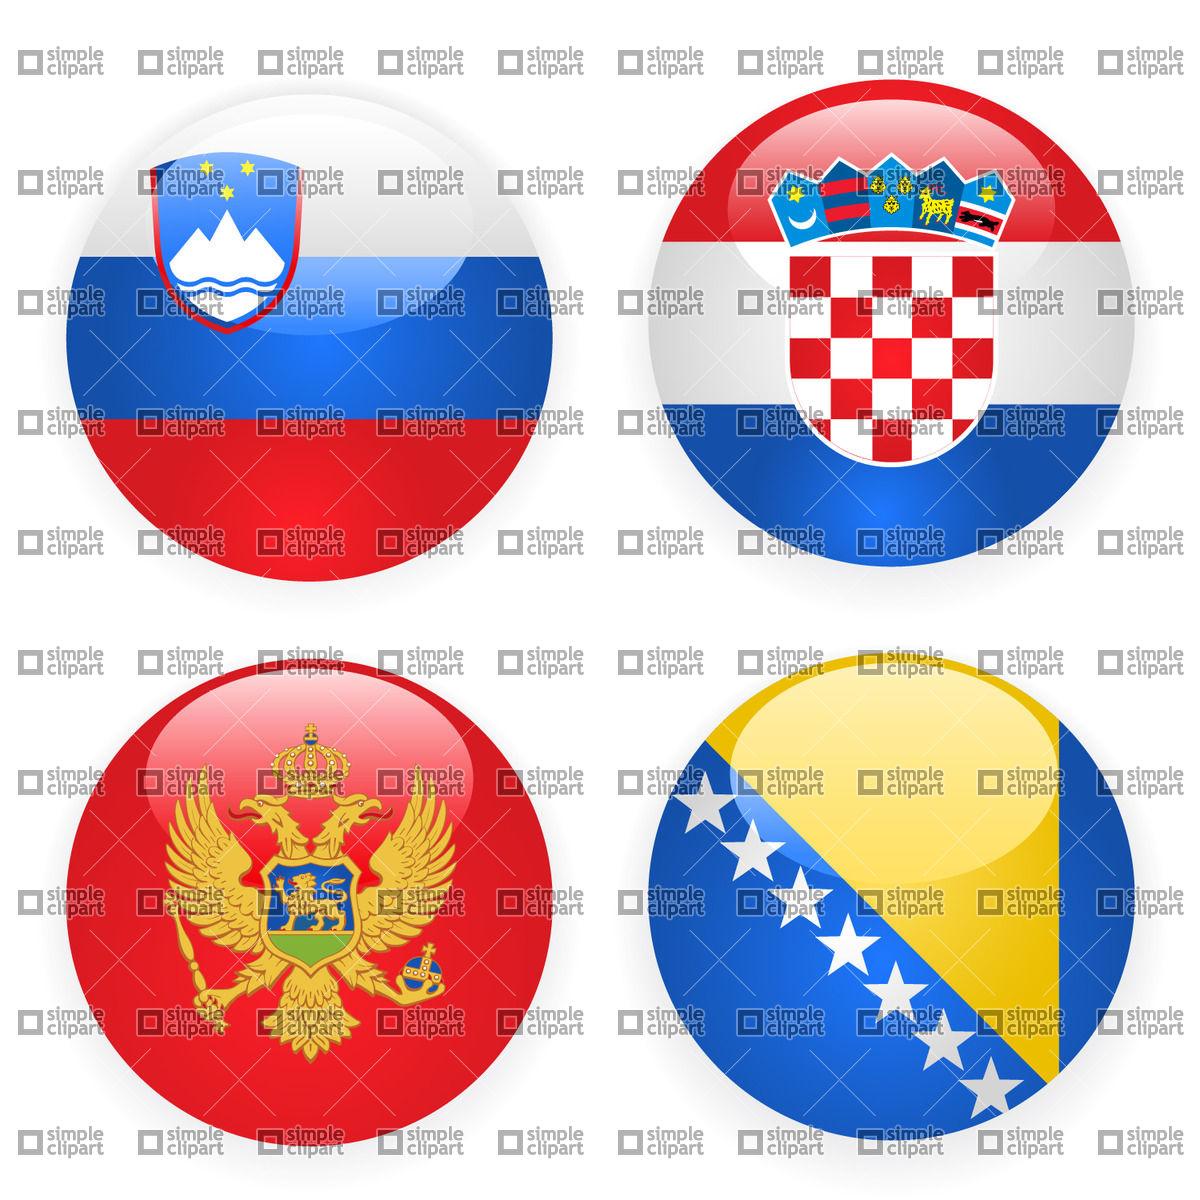 Slovenia, Montenegro, Croatia and Bosnia and Herzegovina button.